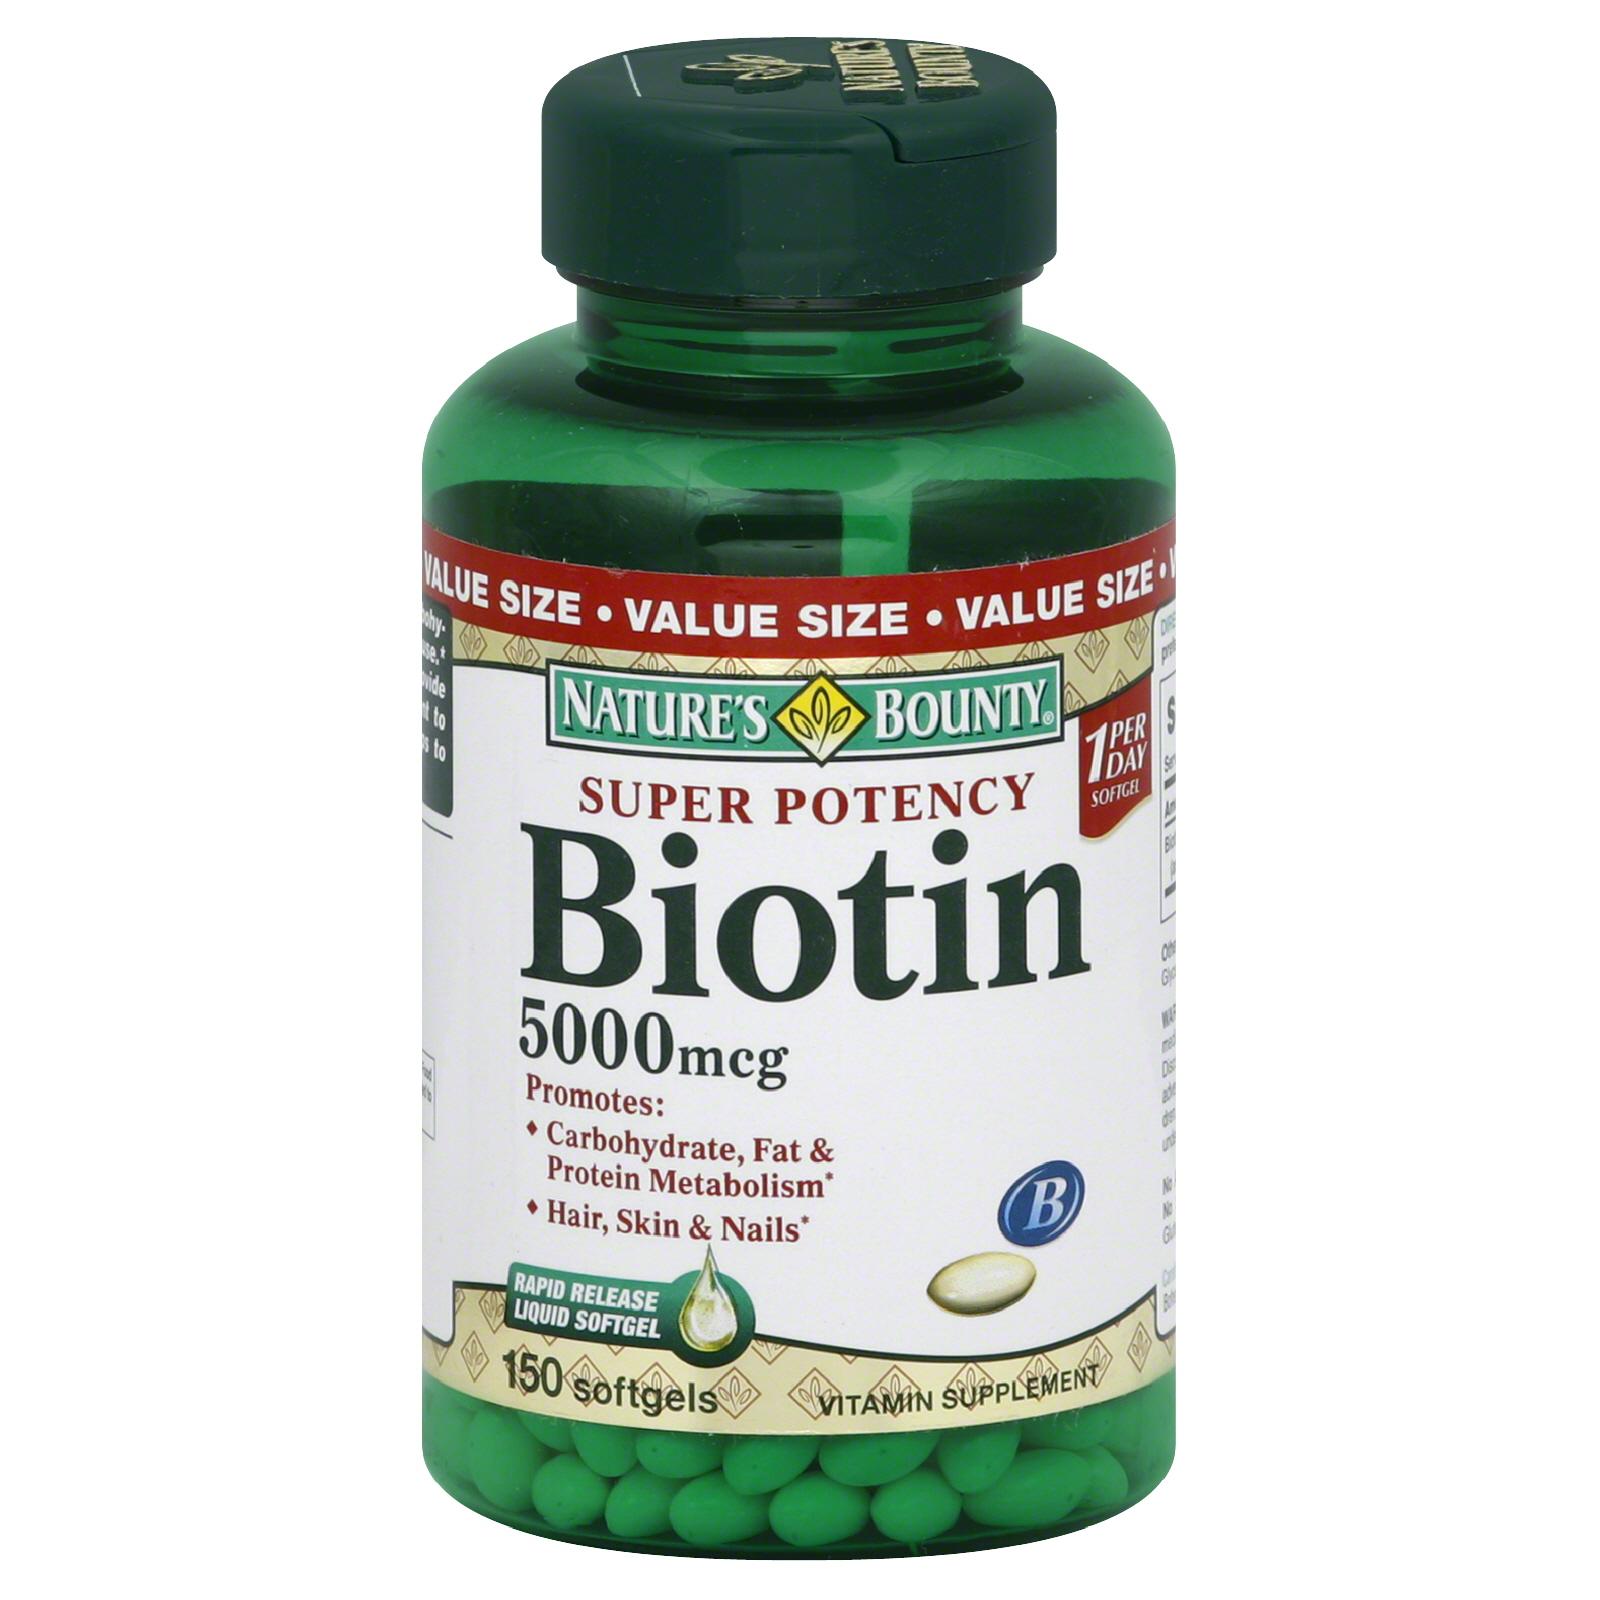 Nature's Bounty Super Potency Biotin 5000 mcg softgels